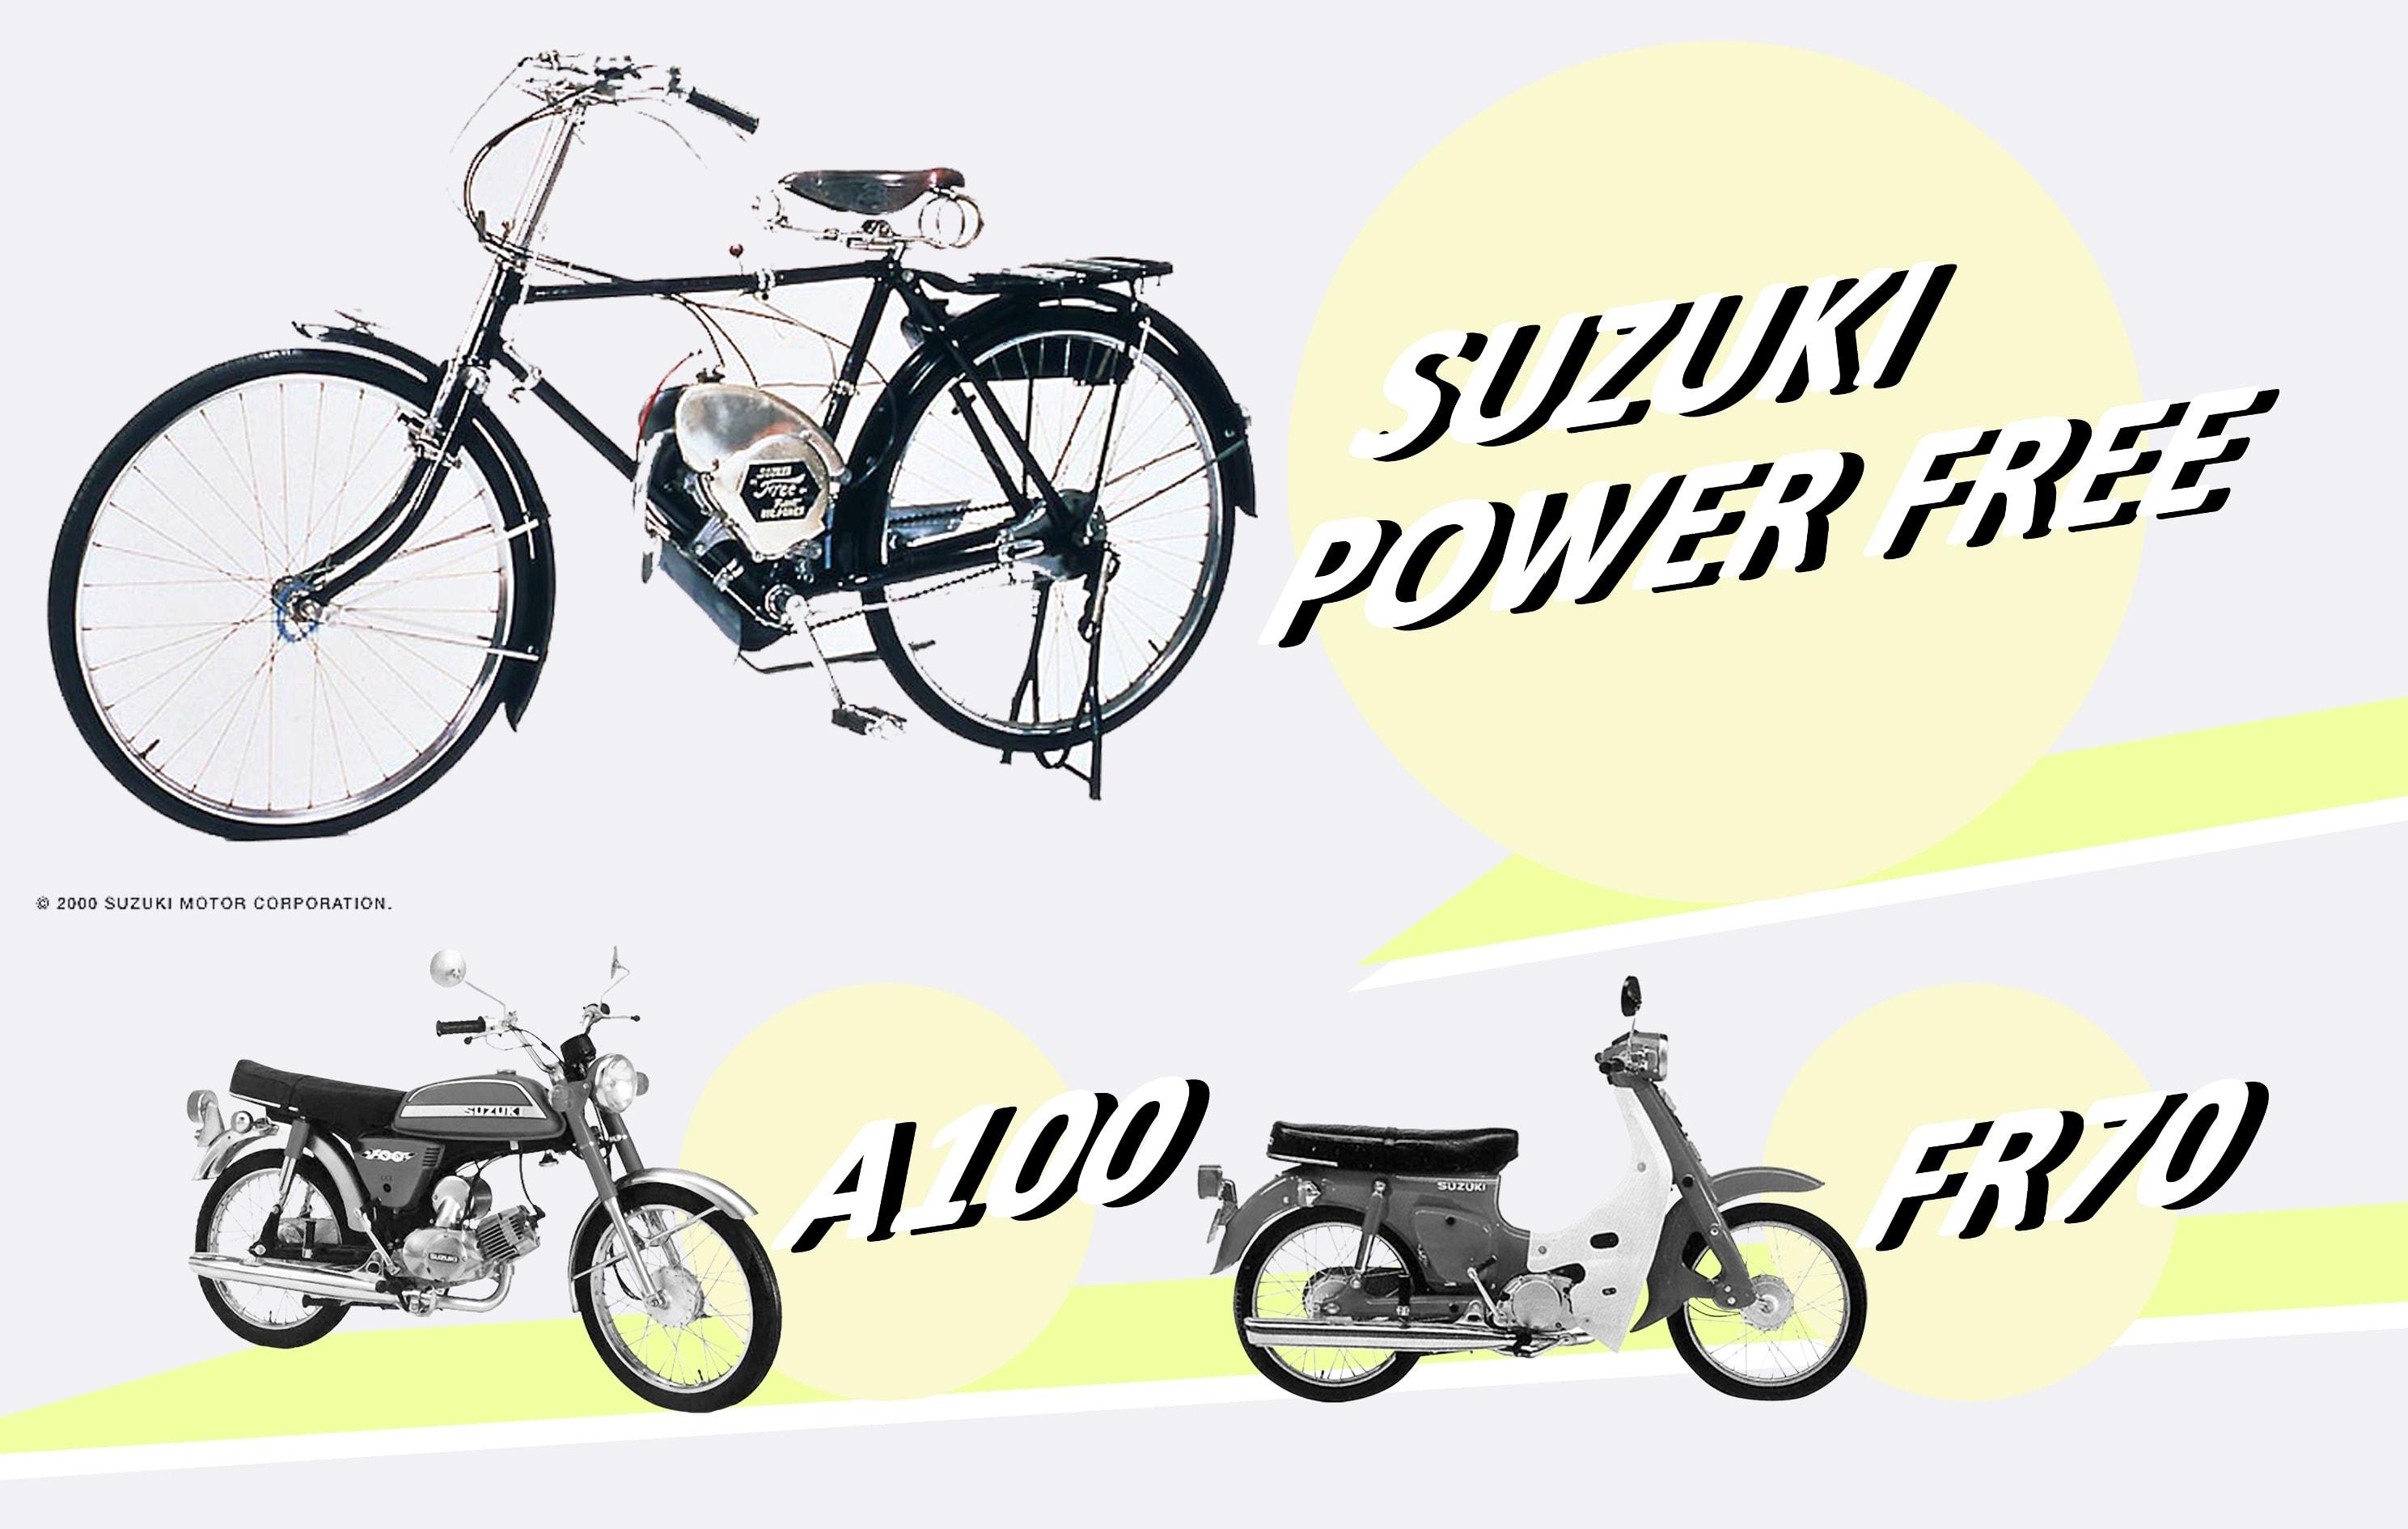 6ca30-suzuki-indonesia-motorcycle-history.jpg